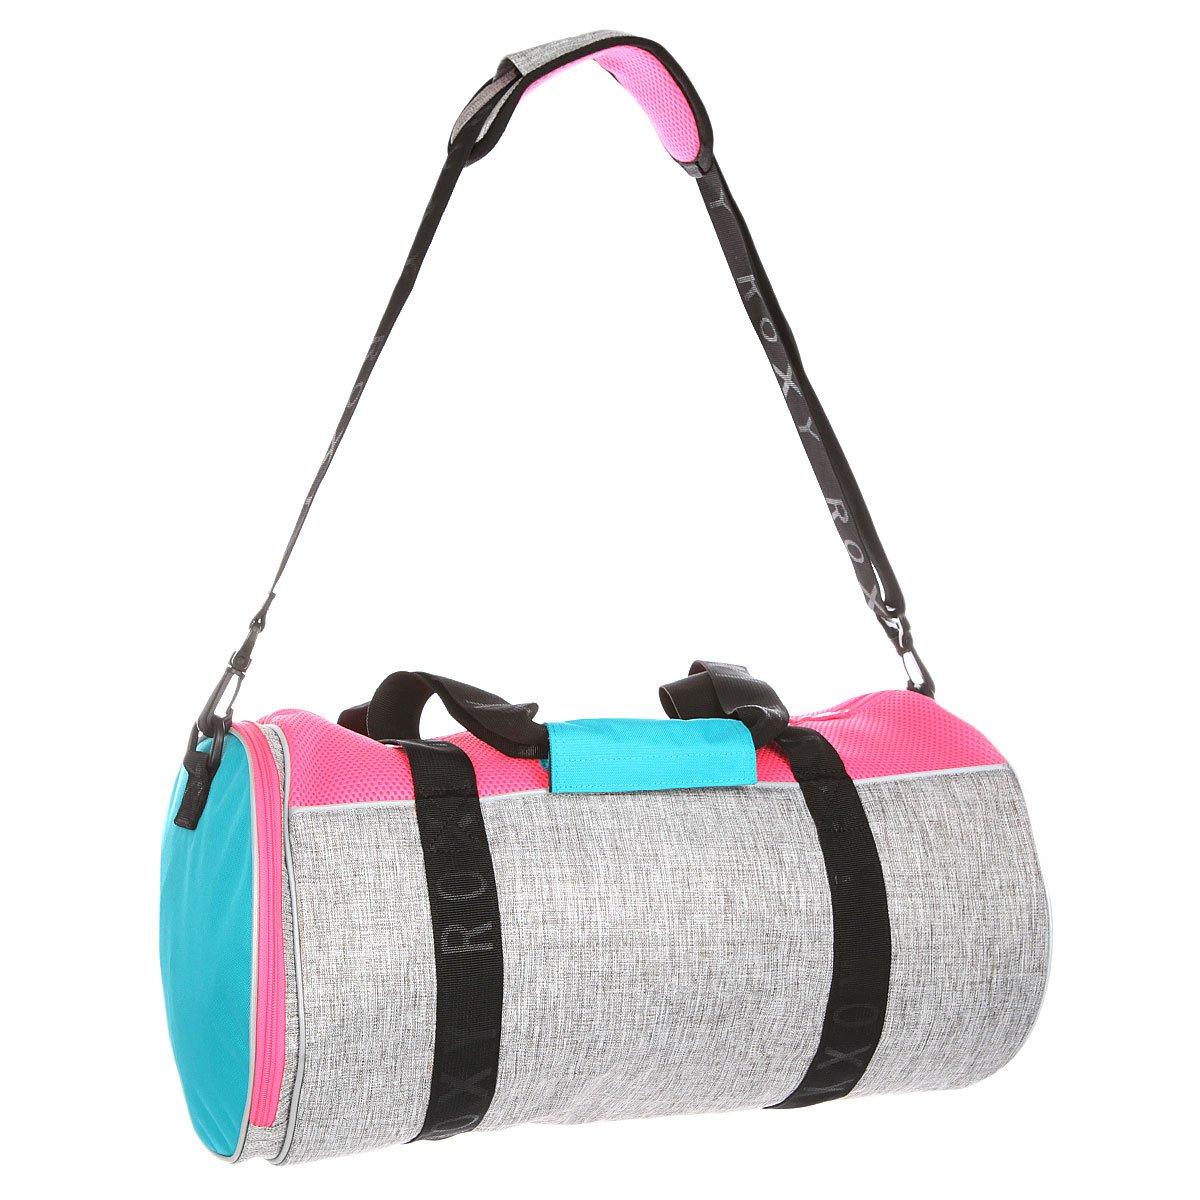 50dadd708e71 Купить сумку спортивная женскую Roxy Ribon Heritage Heather ...